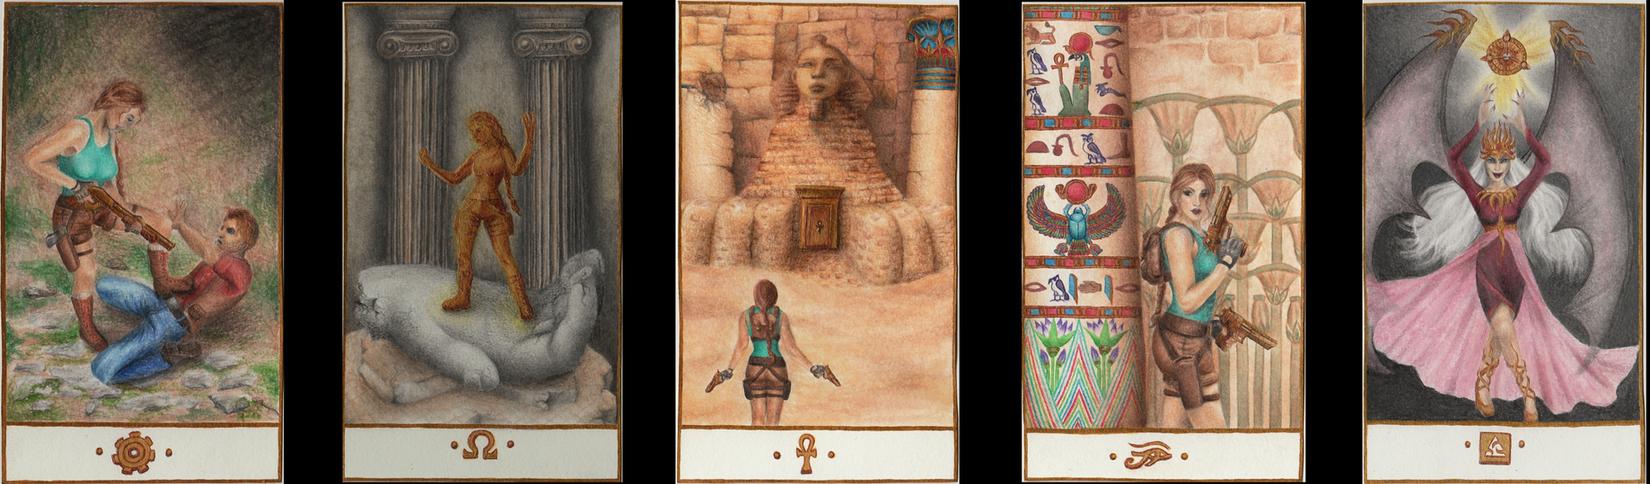 Tomb Raider Card Design by alienmasked